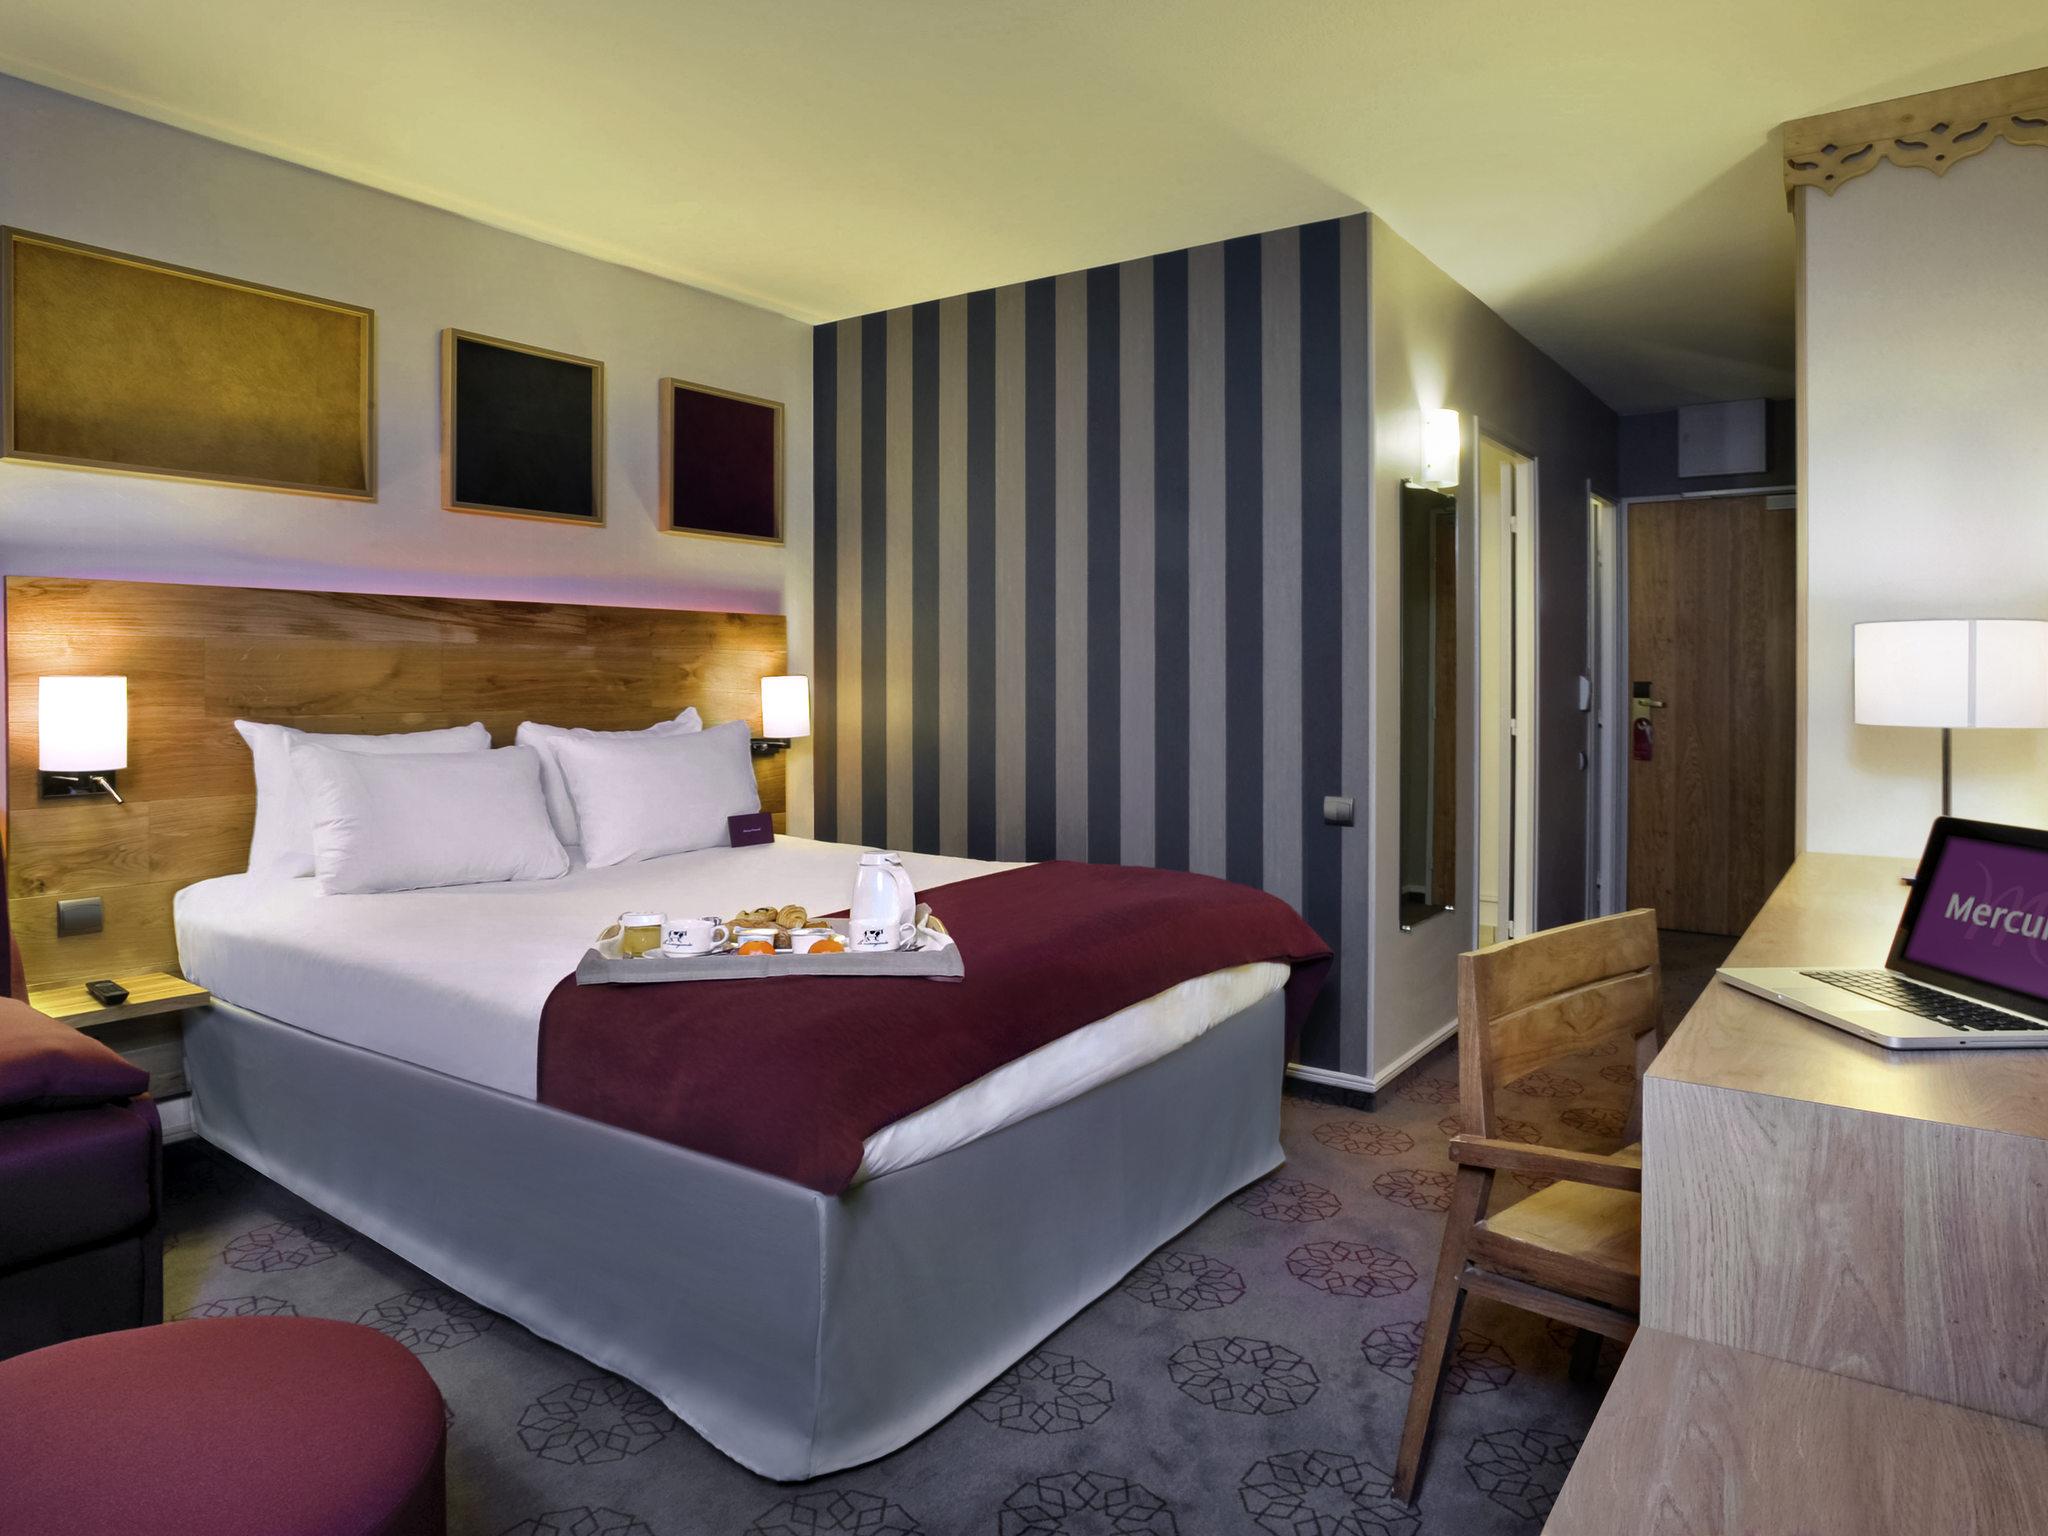 Hotel – Hotel Mercure Saint Lary Sensoria